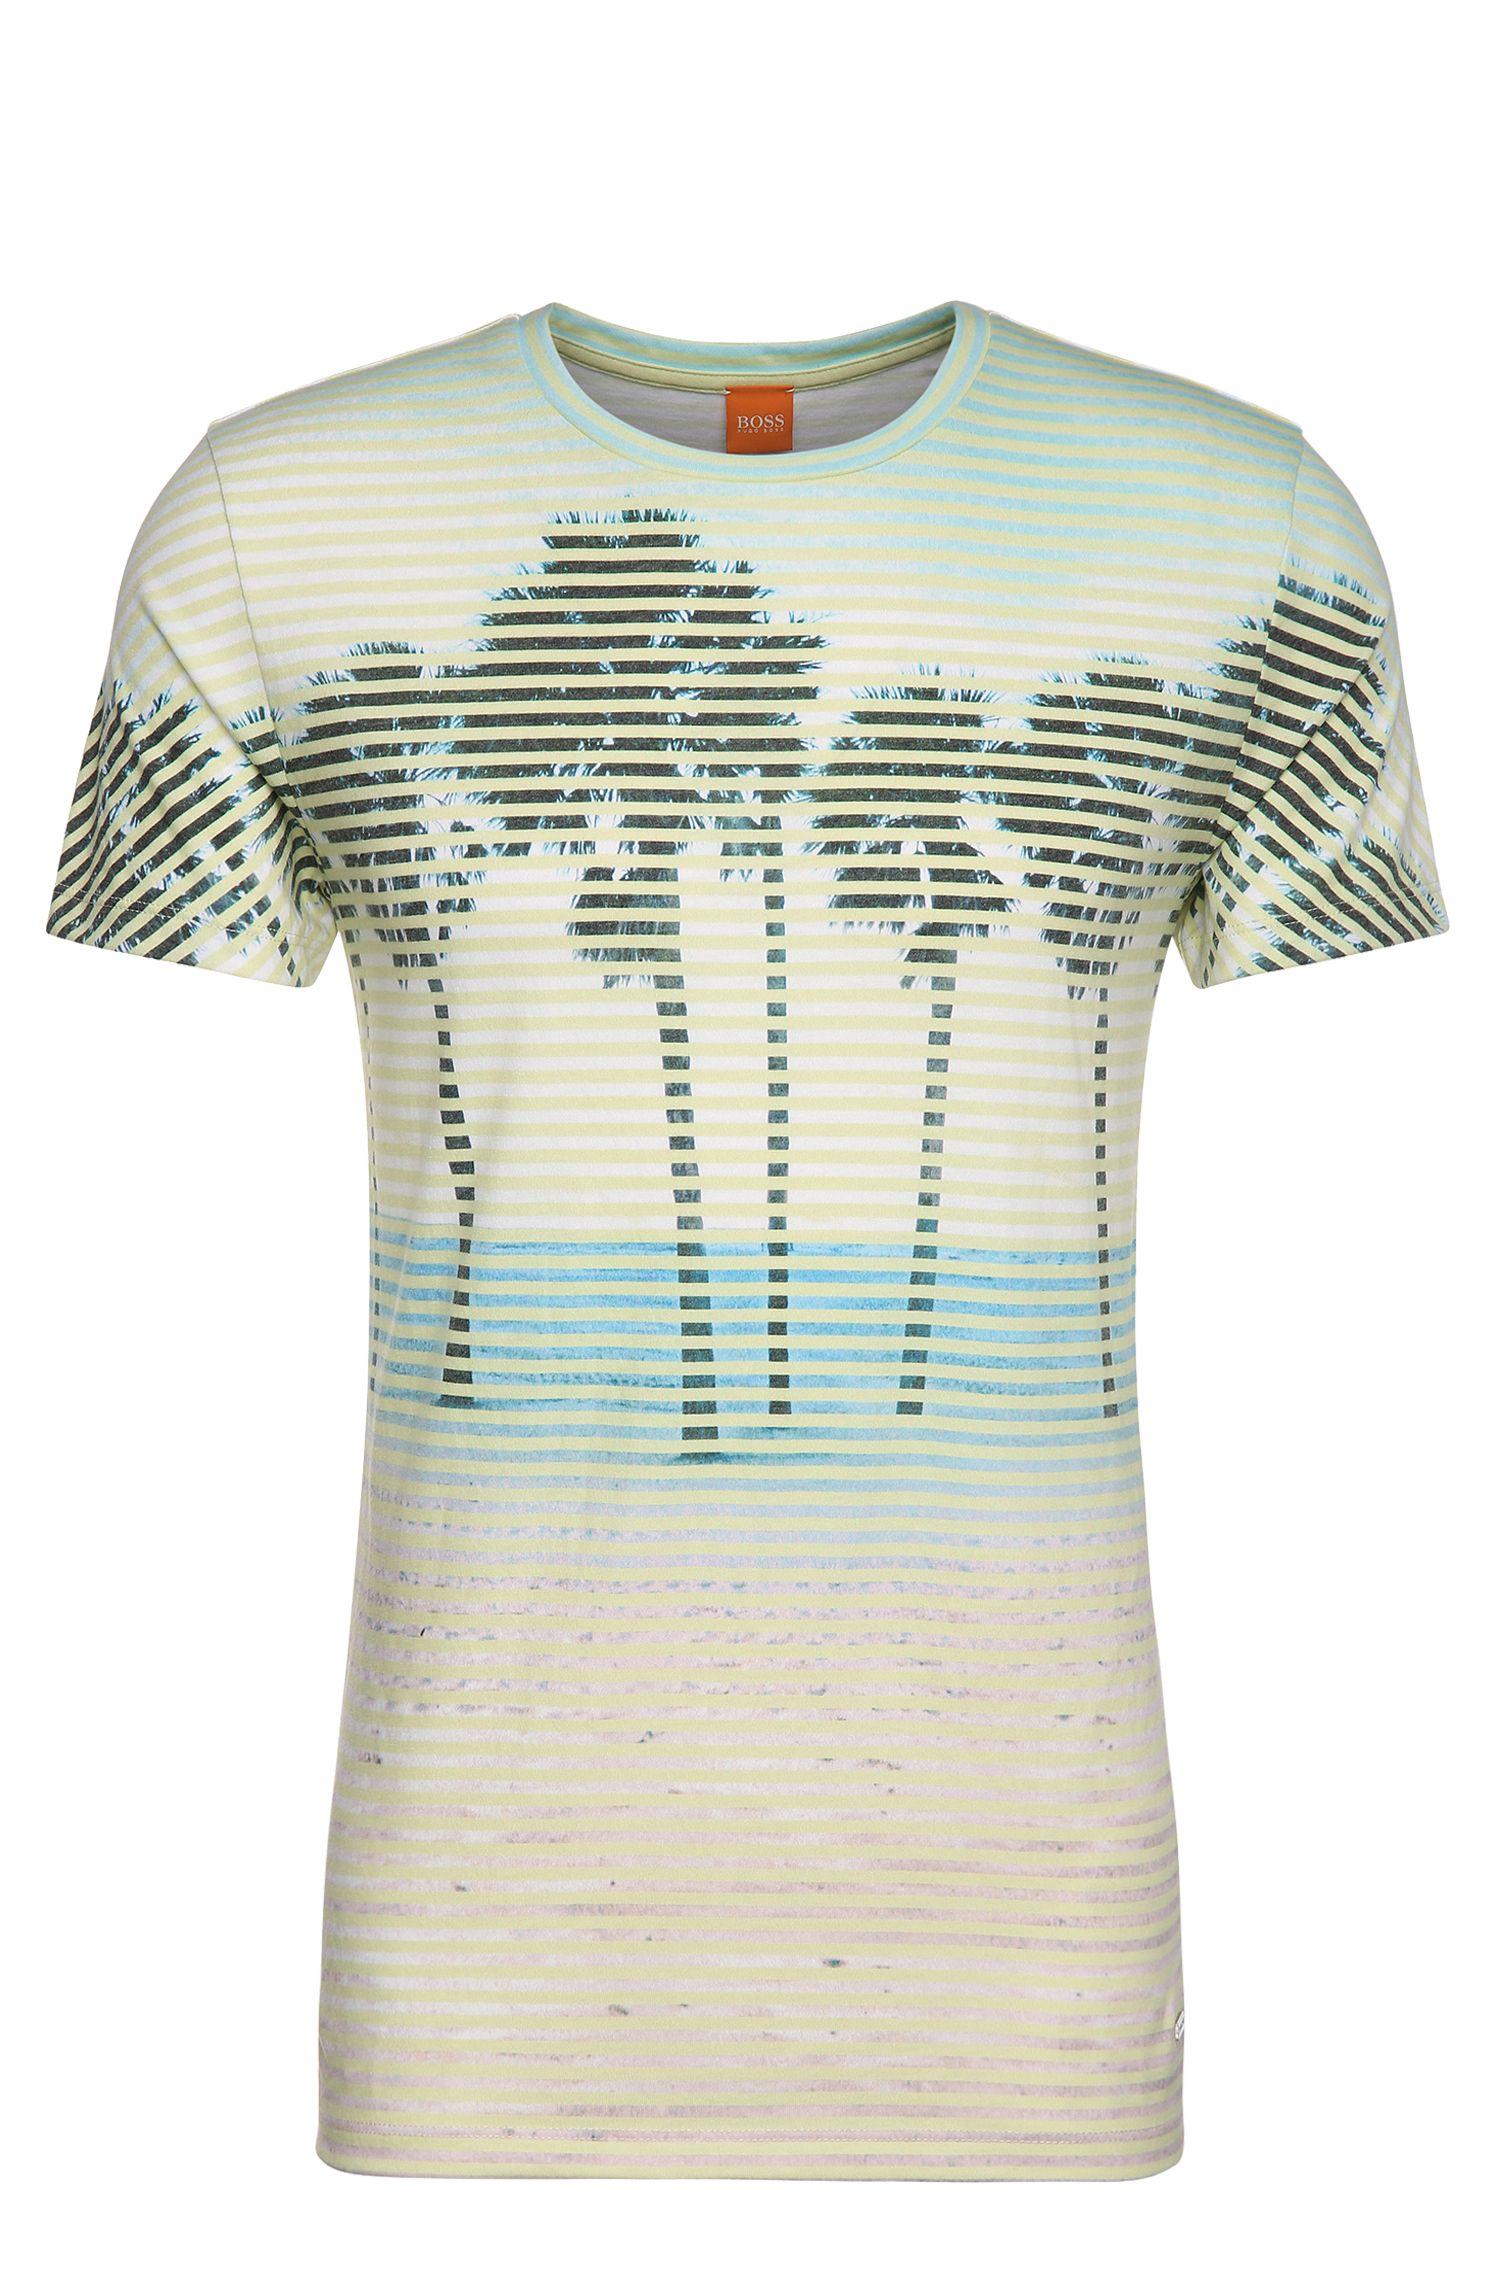 'Telling' | Layered Graphic T-Shirt